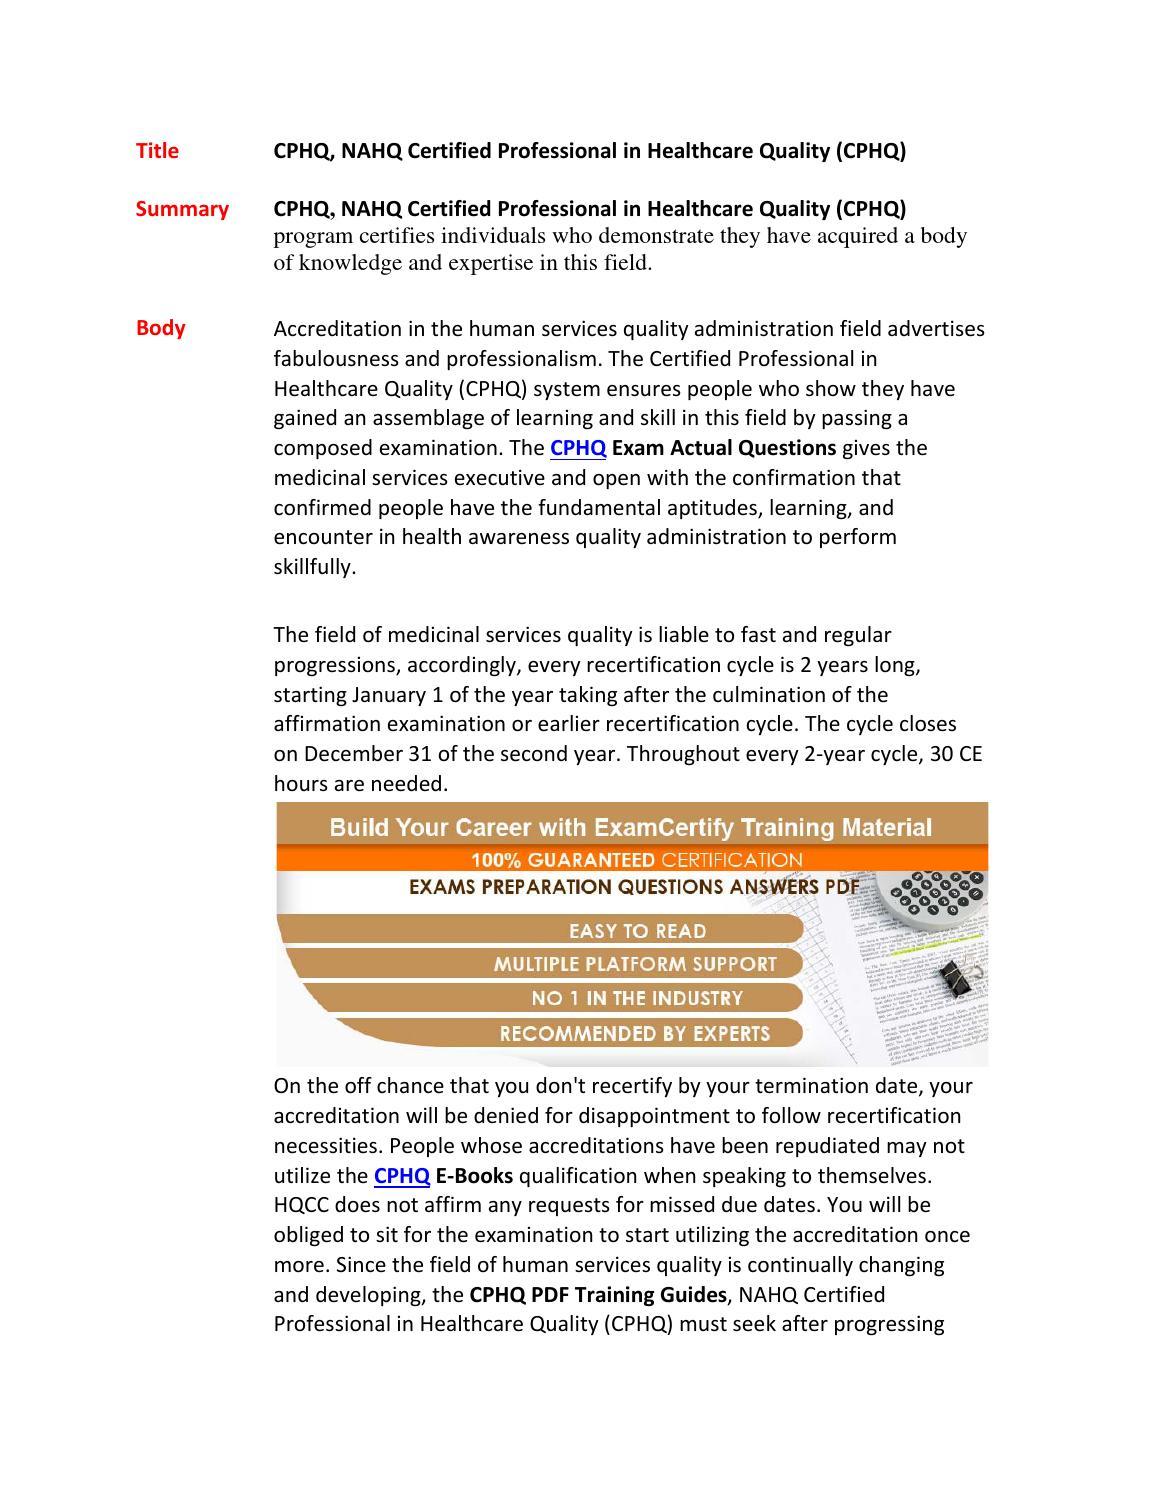 Cphq pdf download exam by ExamCertify2 - issuu